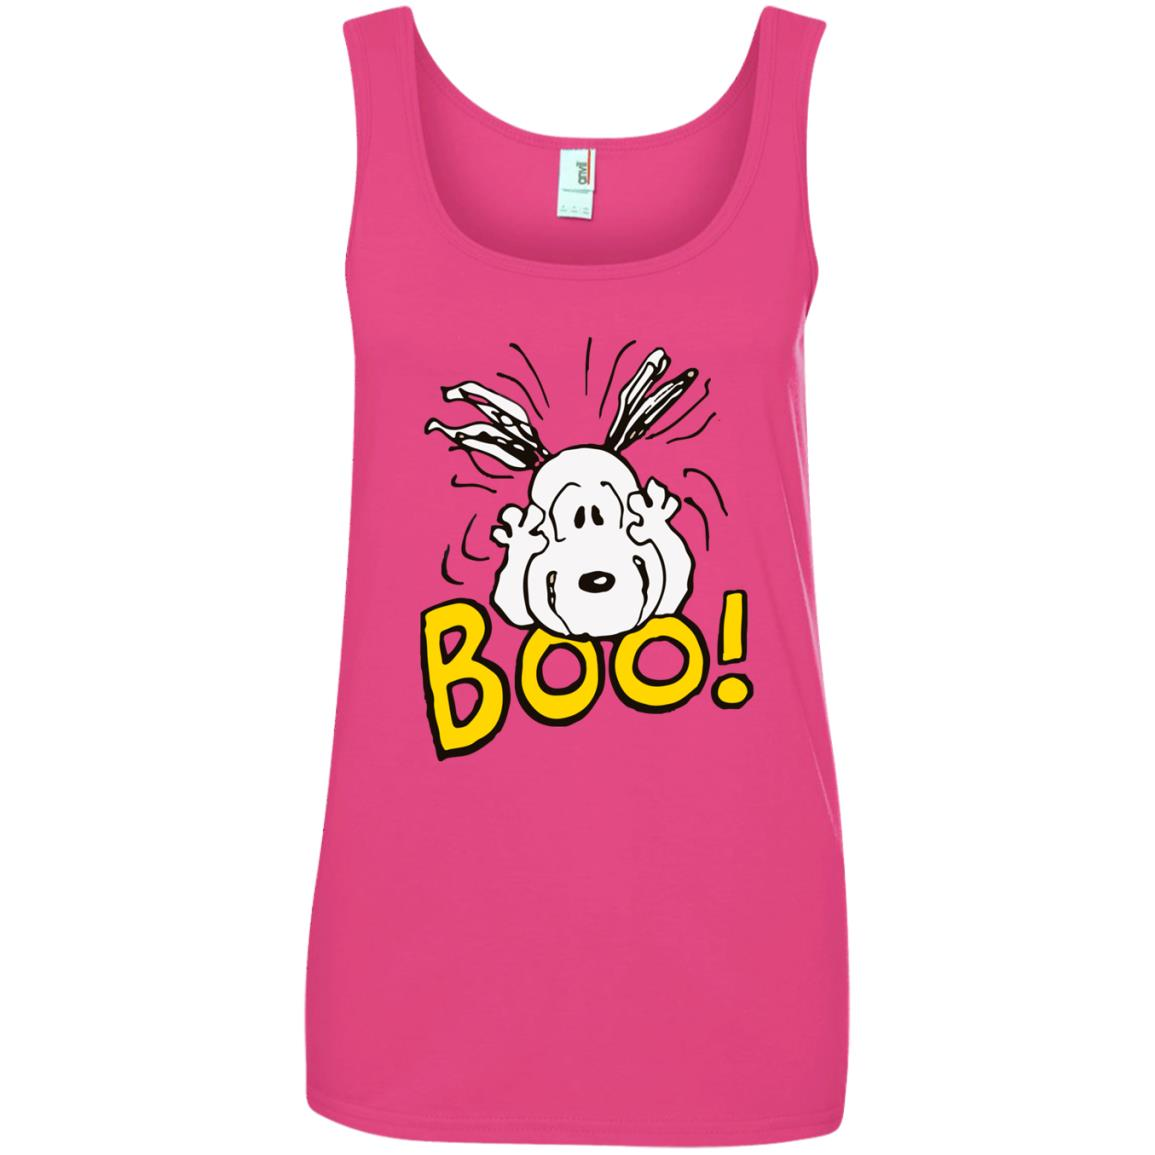 image 2236 - Peanuts Snoopy Halloween Boo shirt, hoodie, tank